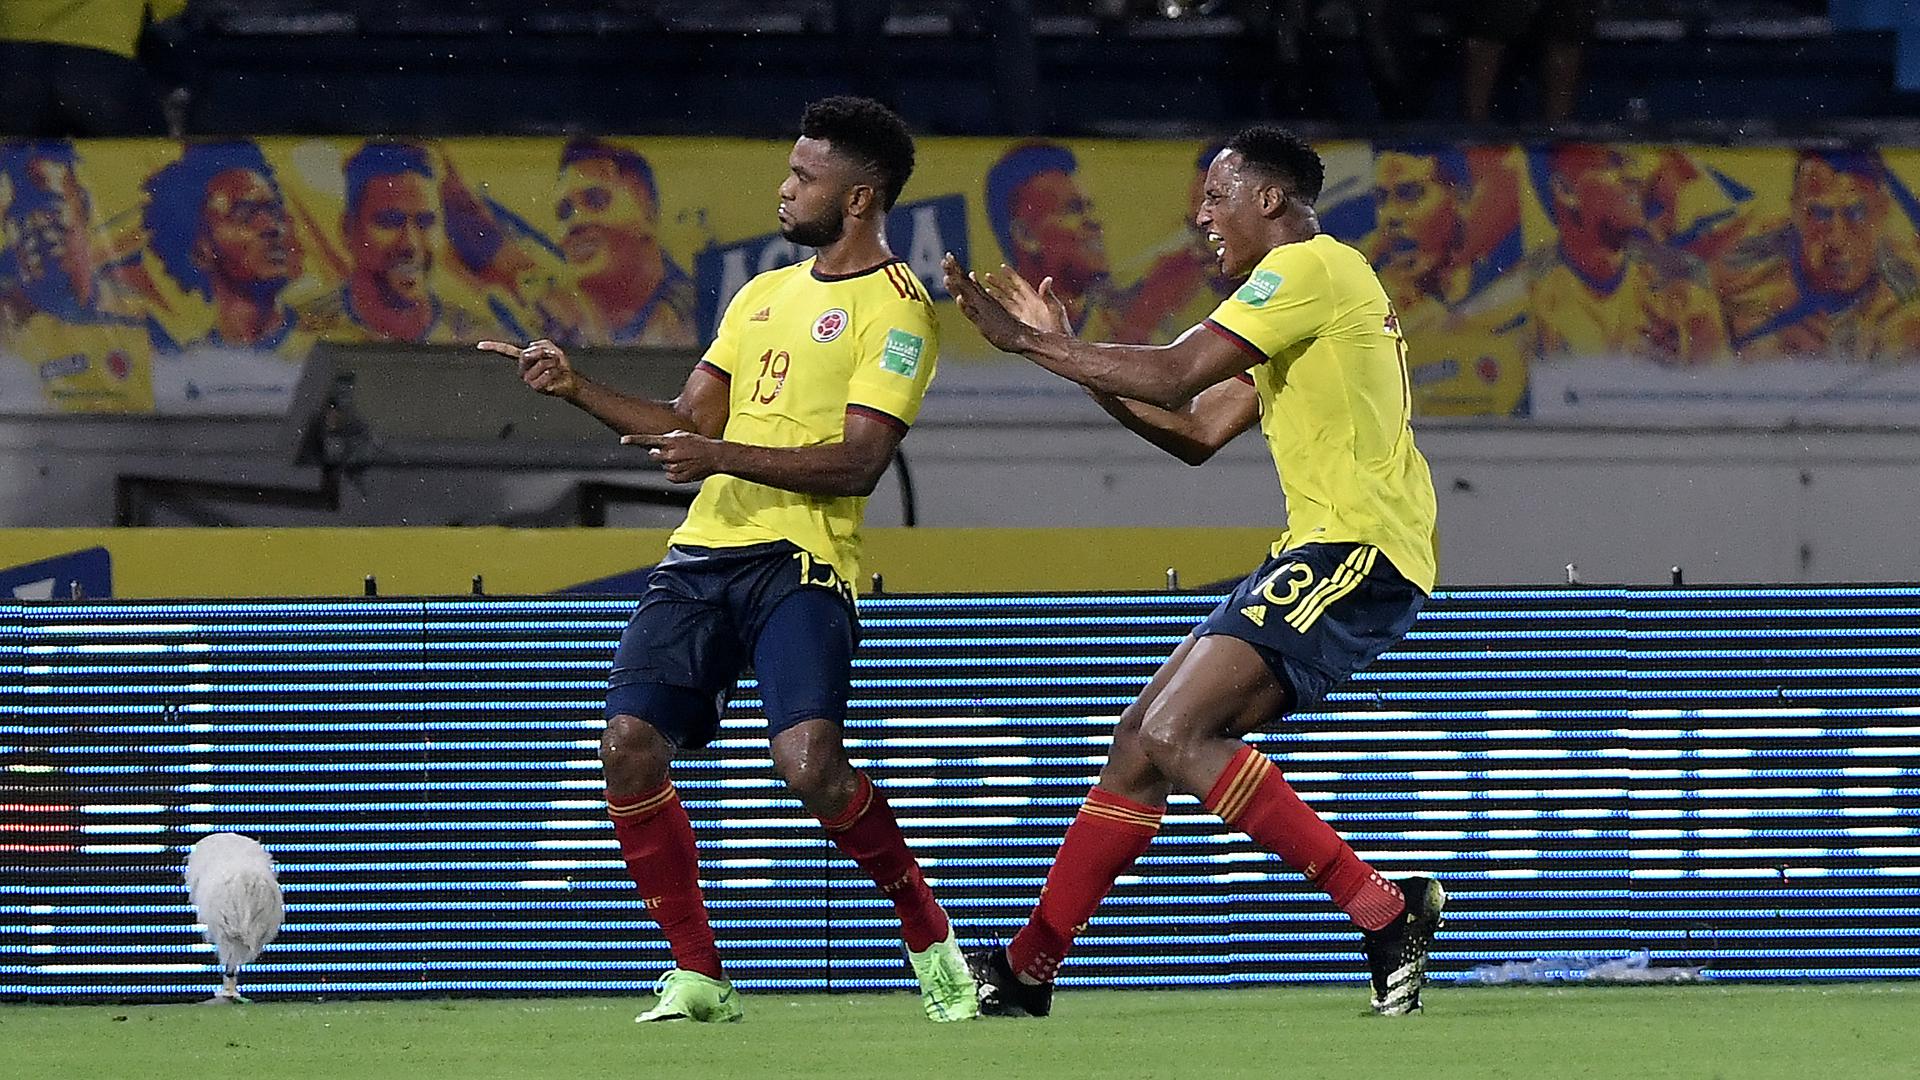 LIVE: Colombia vs Argentina